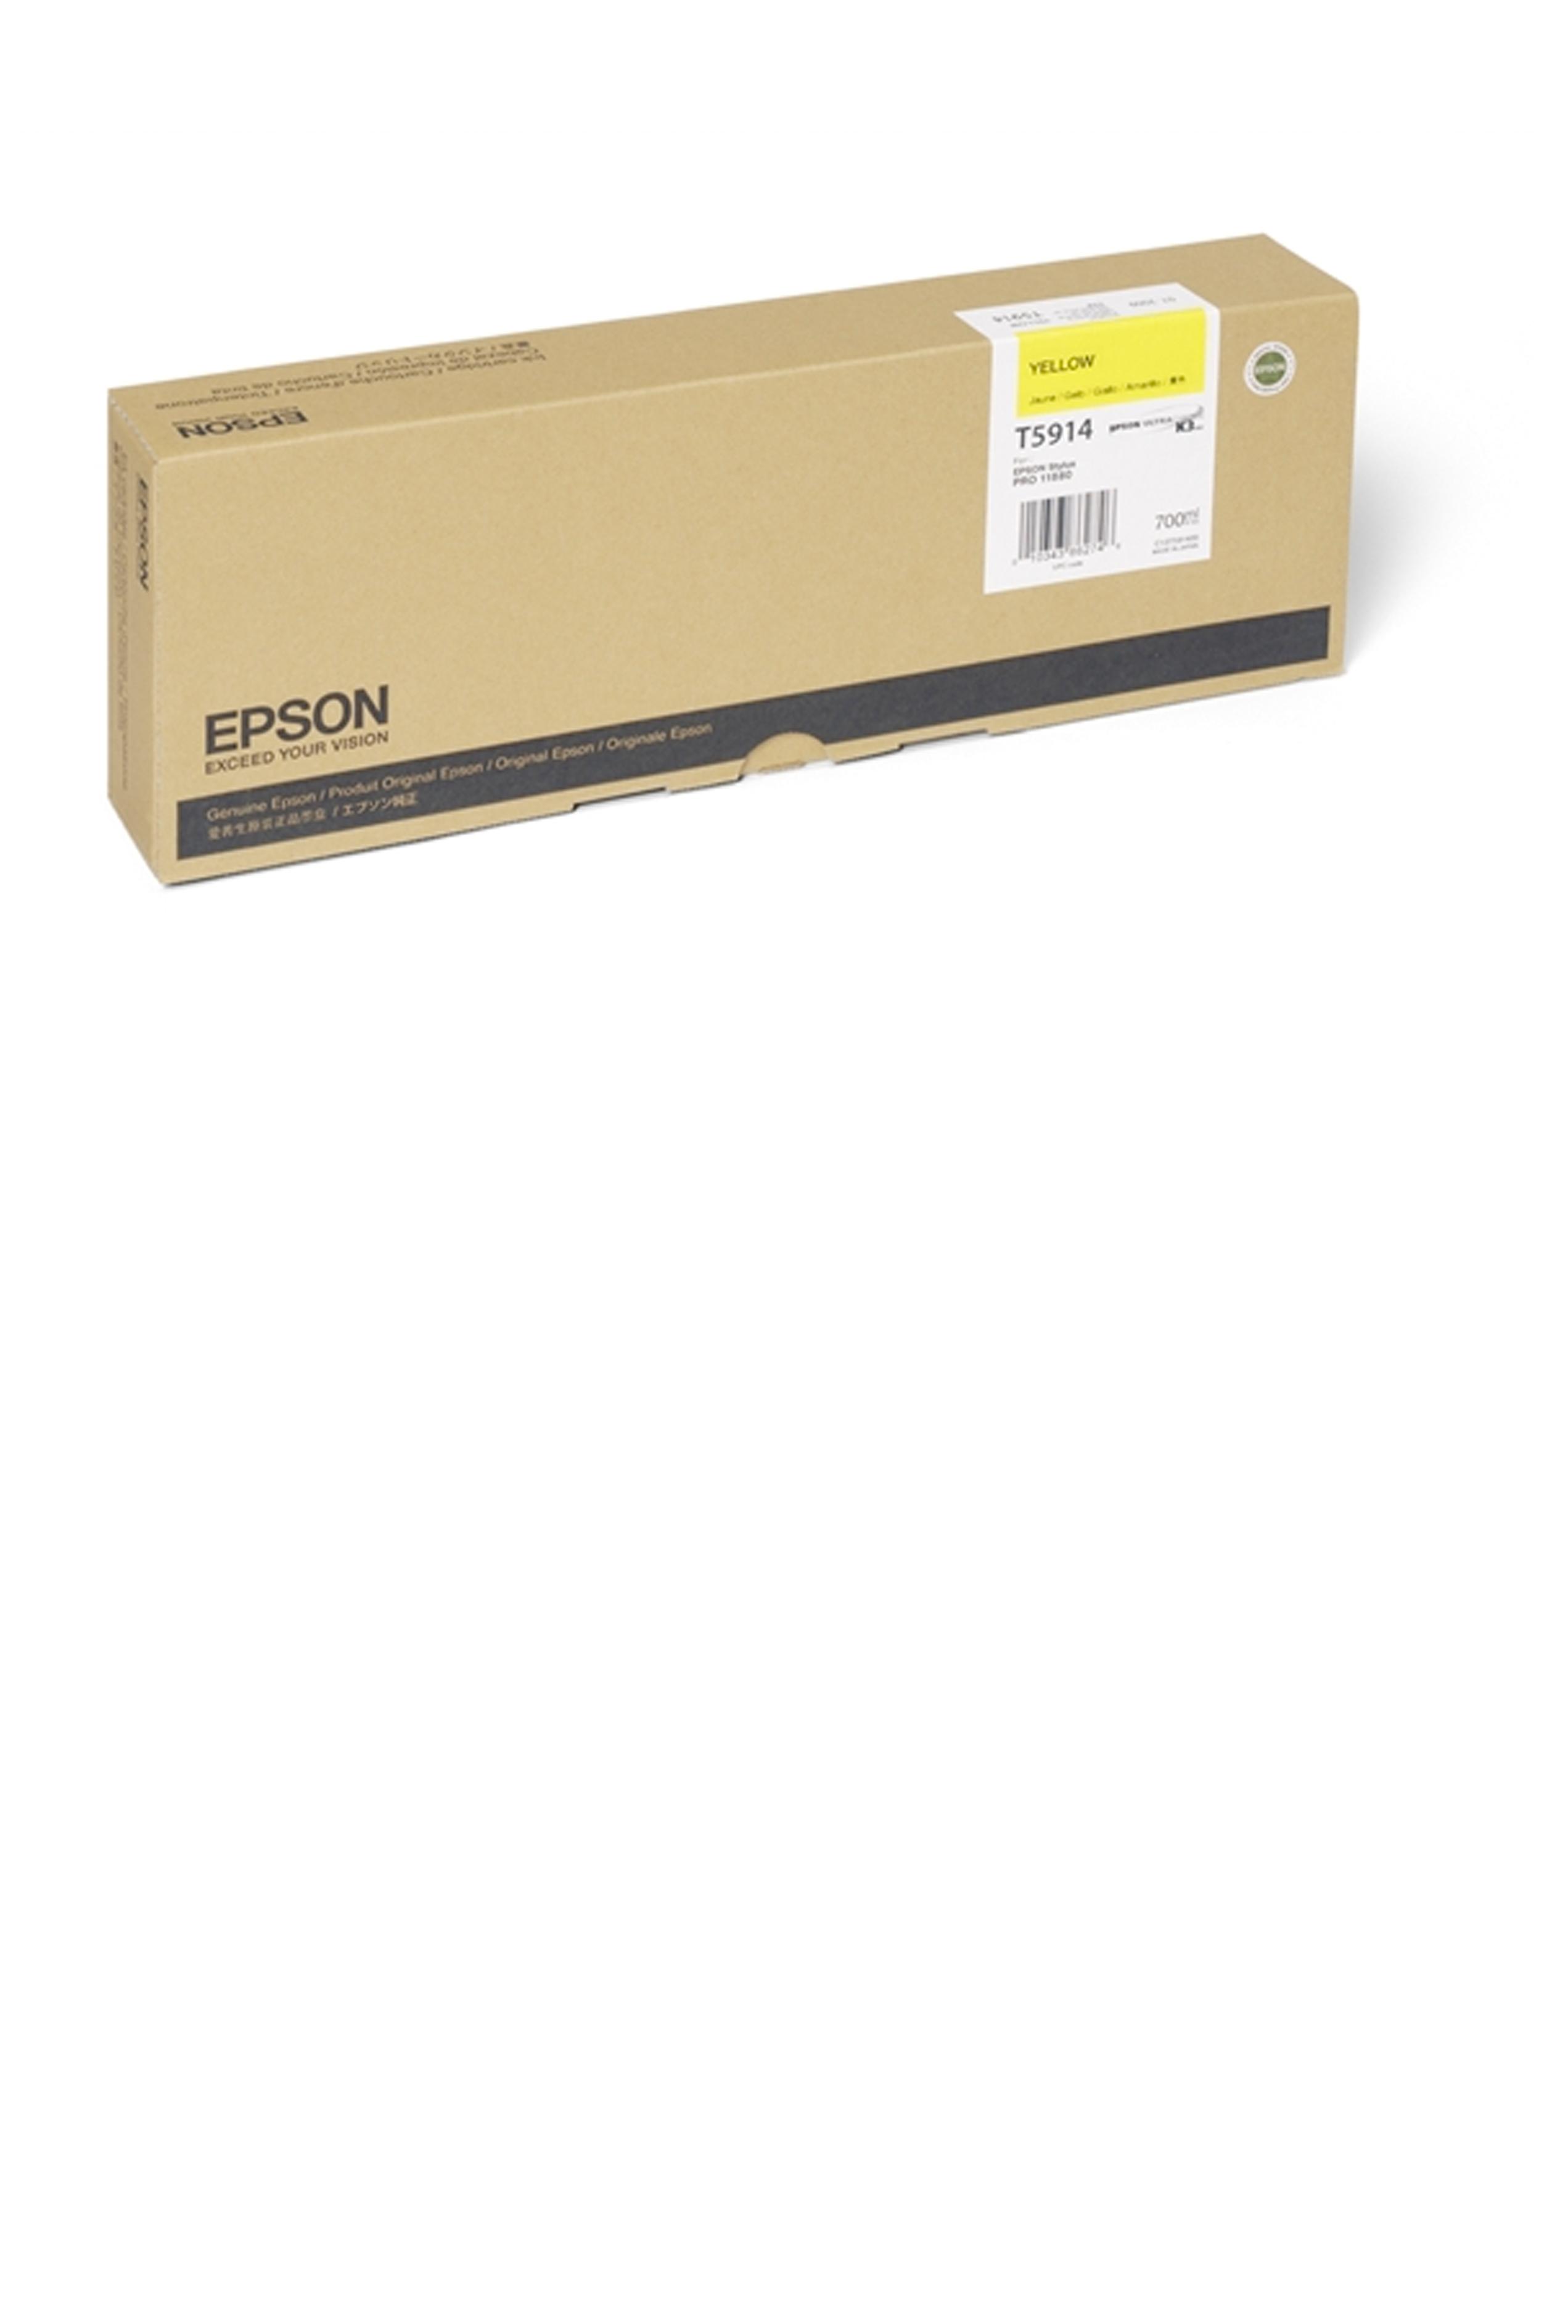 Epson EPSON HI YELLOW INK (700 ML) (T591400)